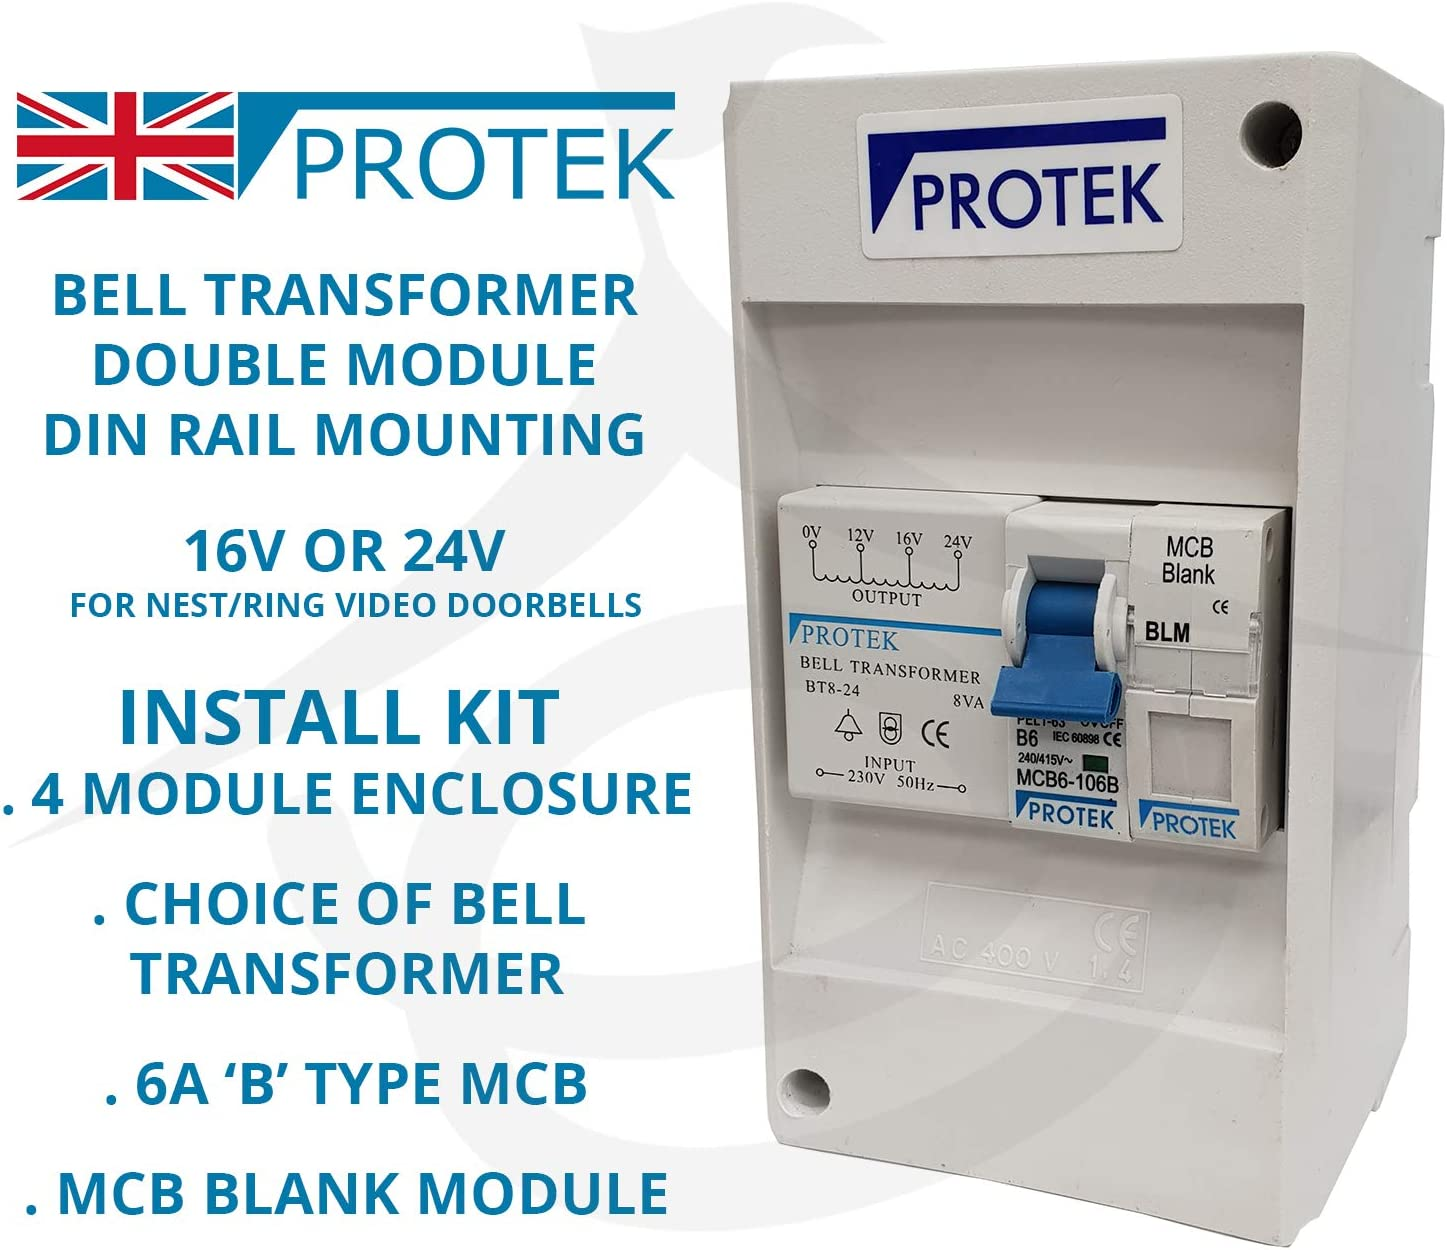 PROTEK Bell Transformer 16V 24V for Video Door Bell Enclosure Wall Mounted 2 Module BT8-24 24V Transformer